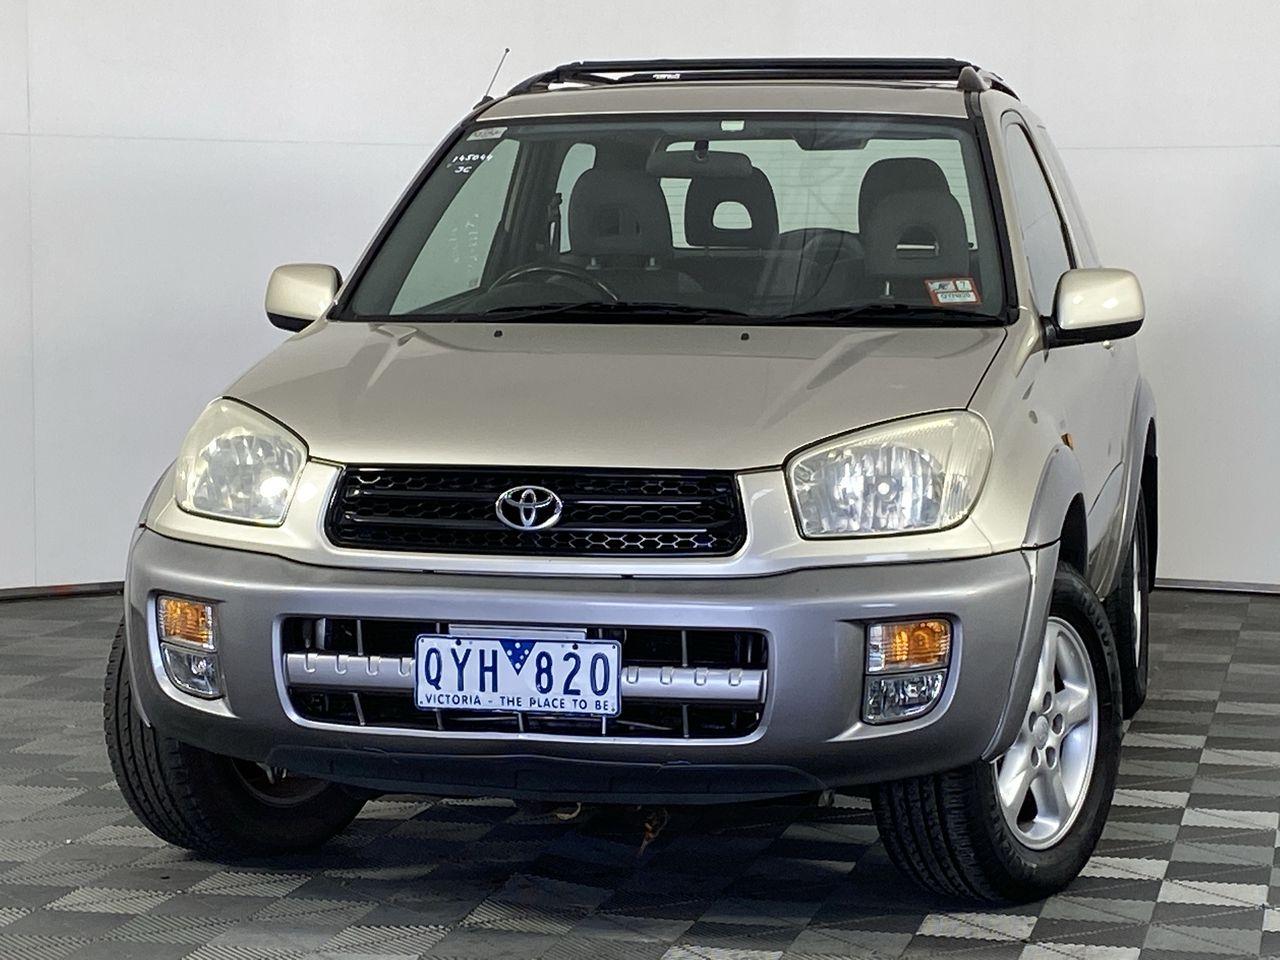 2001 Toyota Rav 4 Cruiser (4x4) Manual Wagon